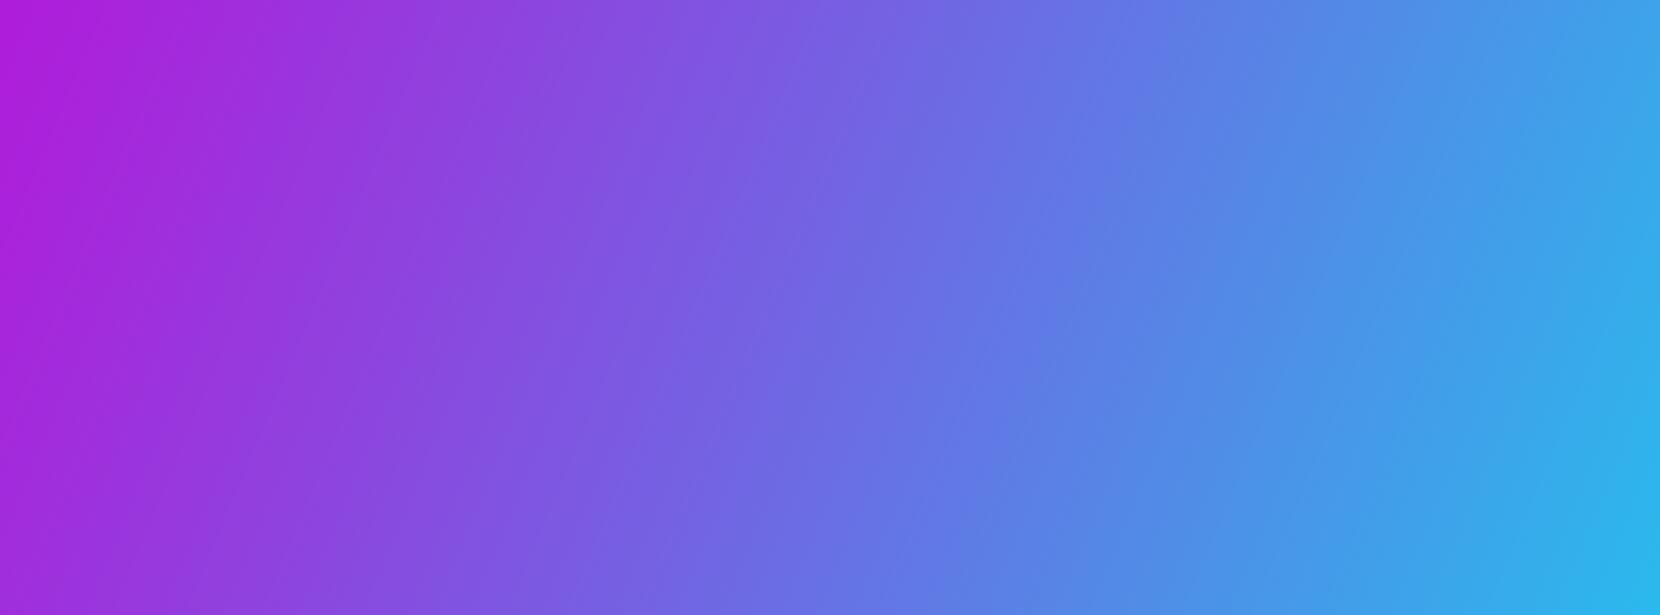 gradient@4x.png